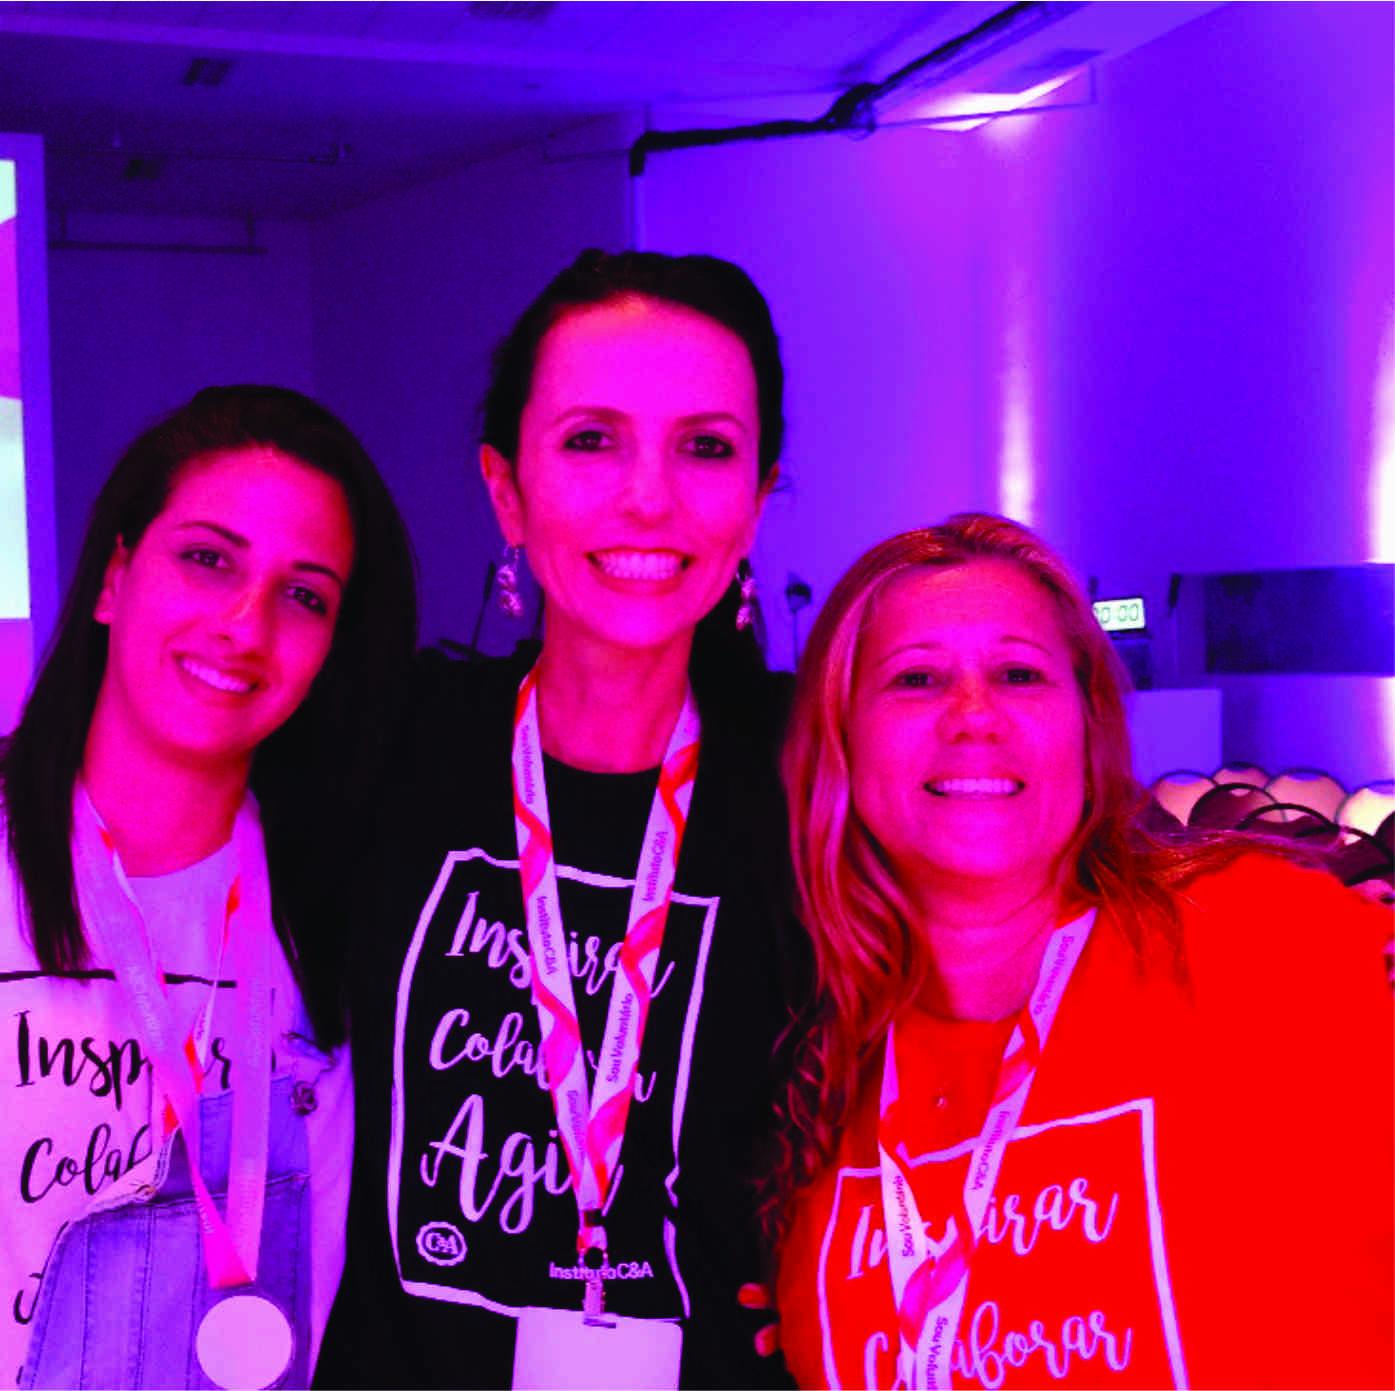 Instituto C&A premia Unidade Emilién Lacay por ação de voluntariado empresarial